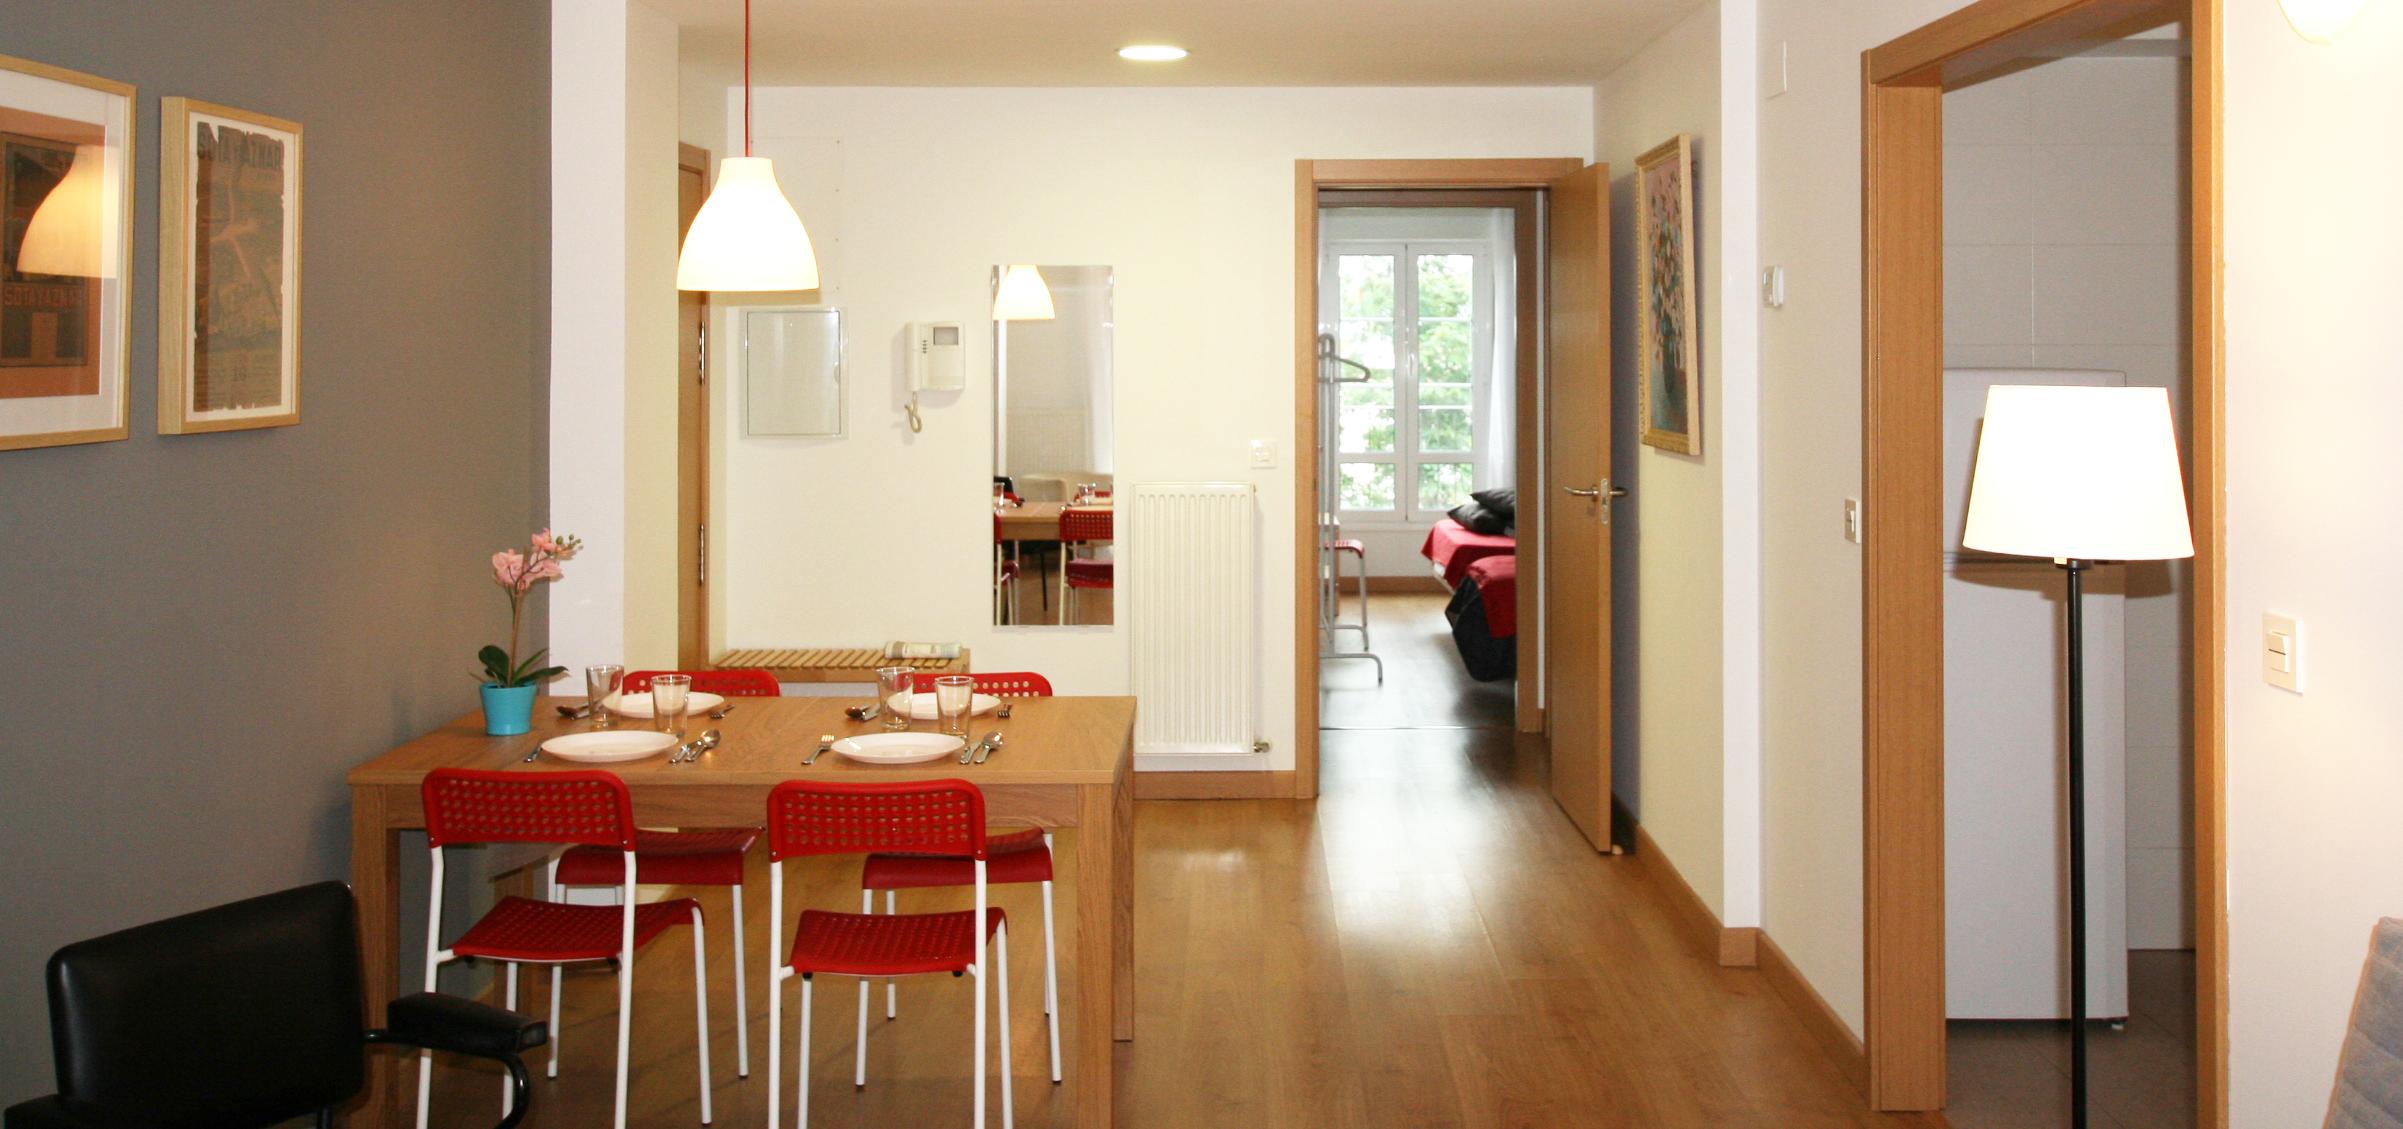 Piso similar: Moderno apartamento en Portugalete